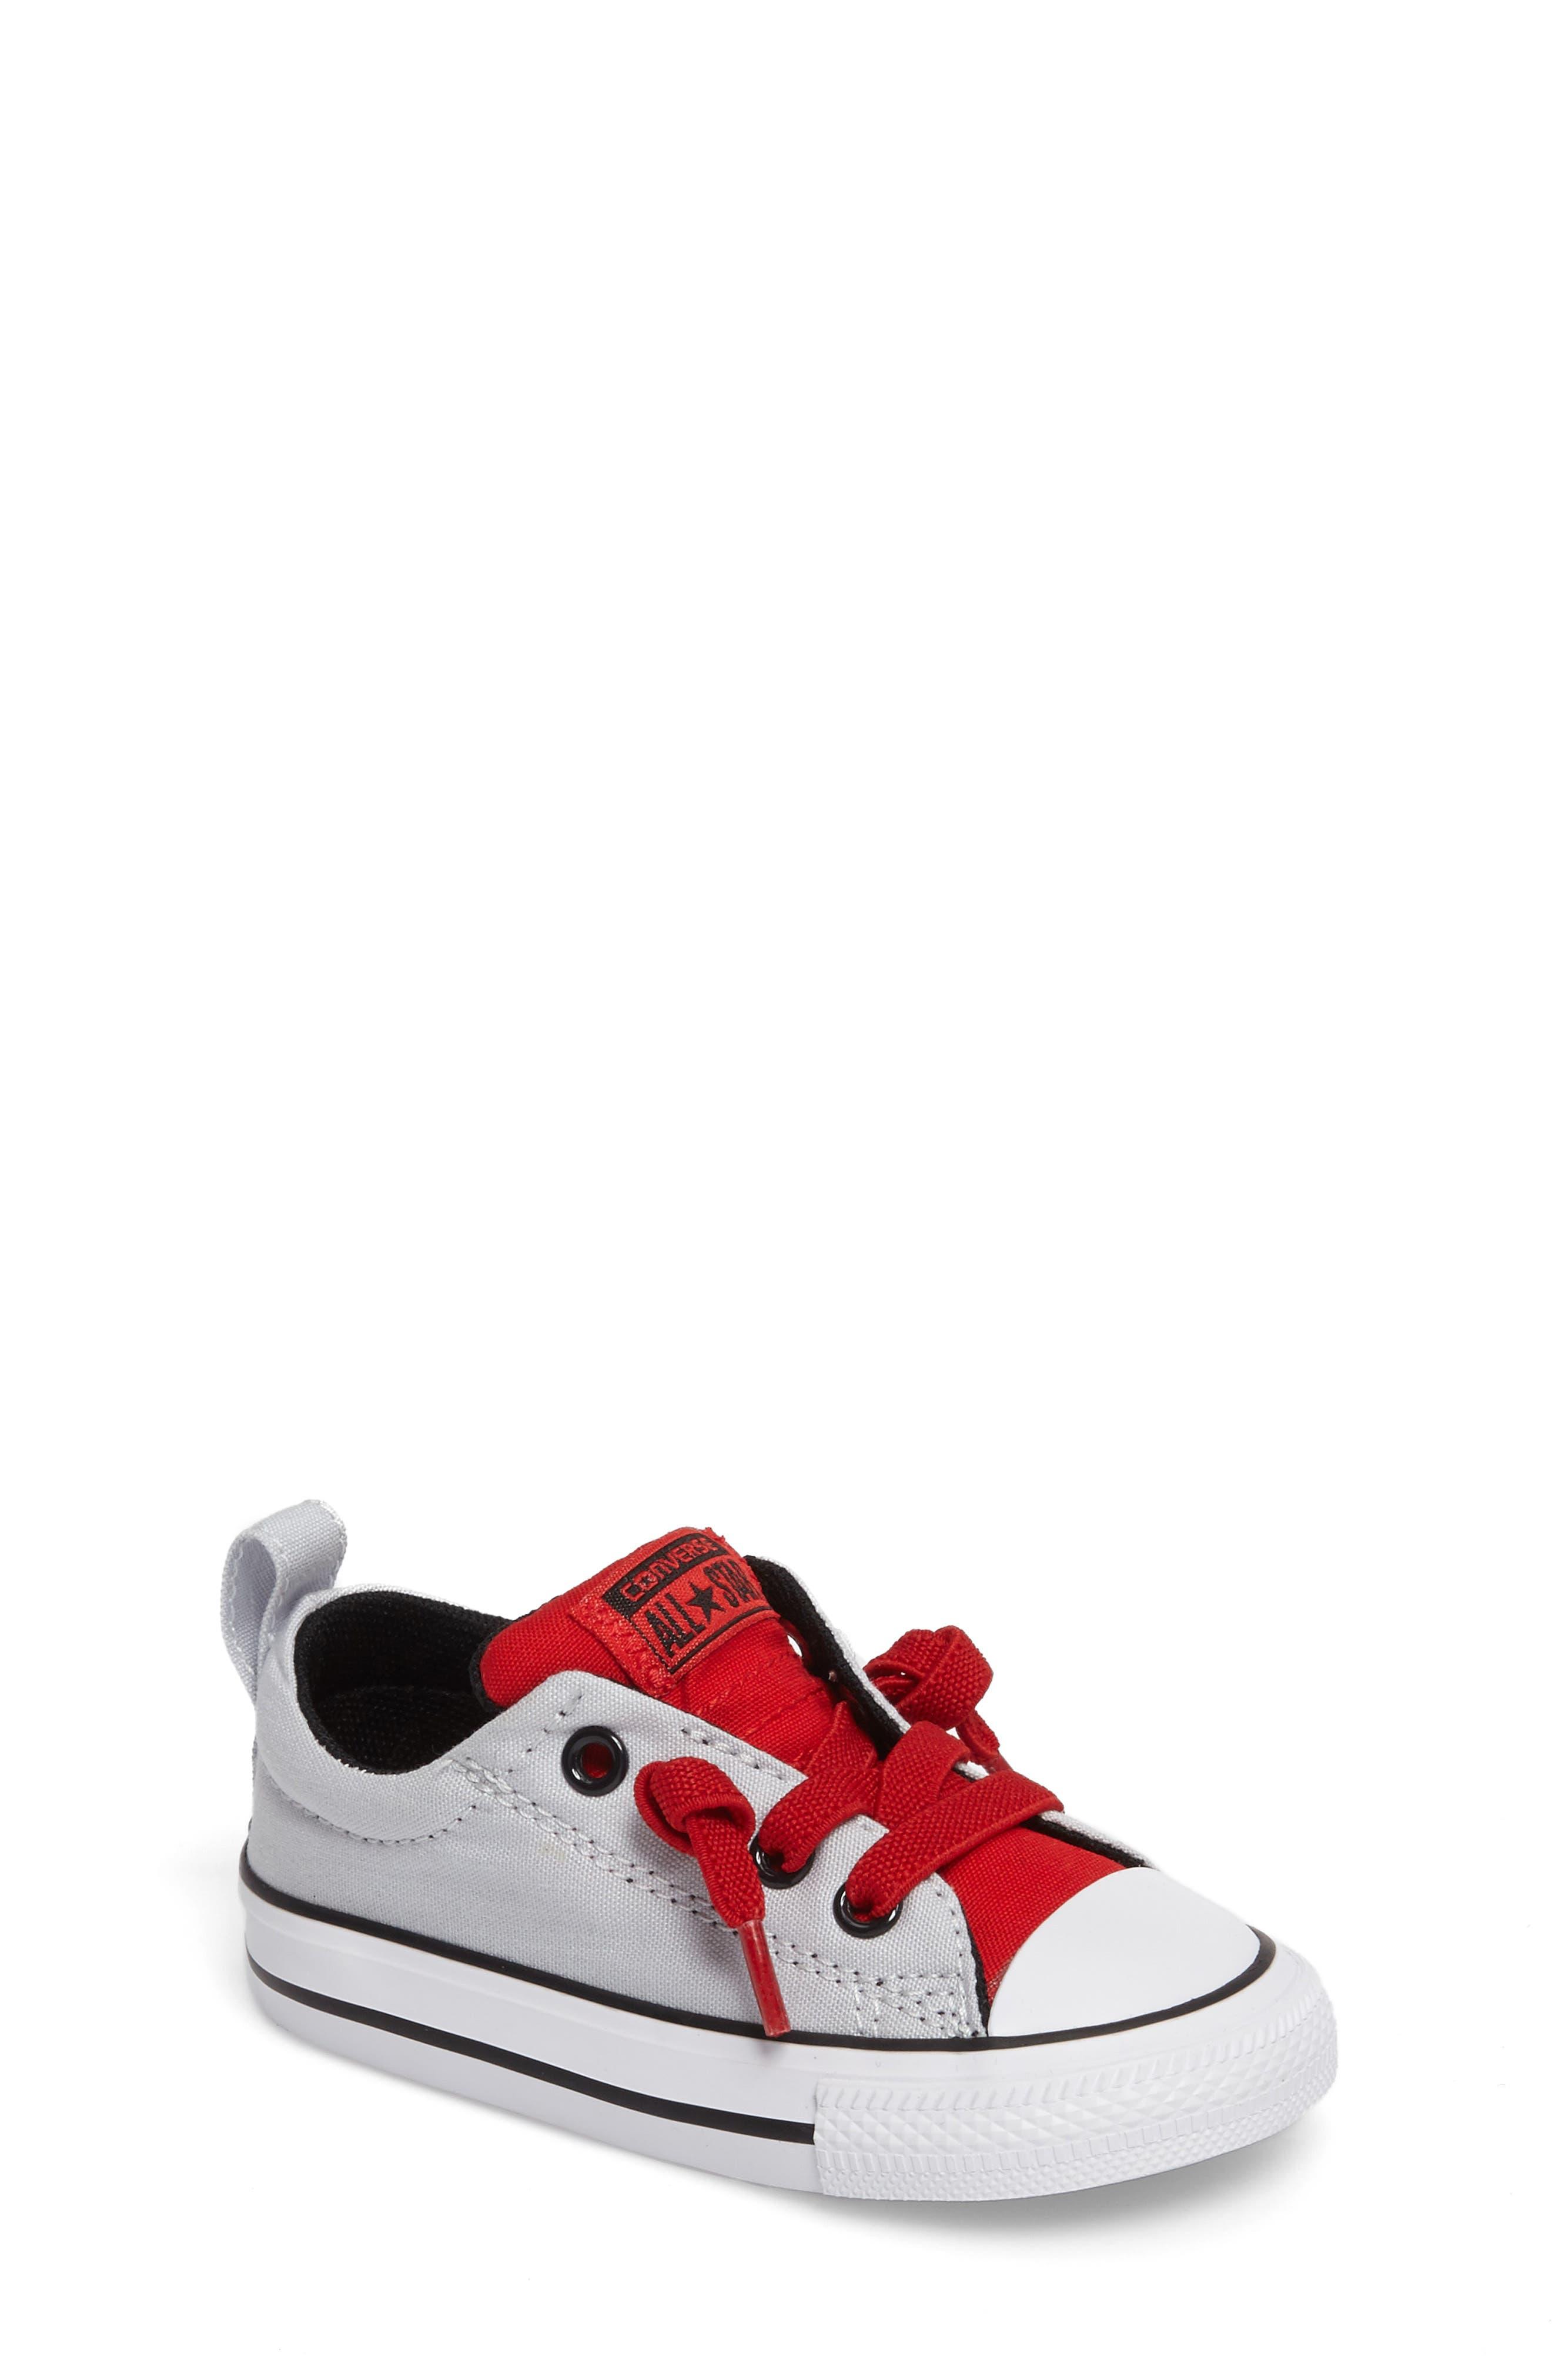 All Star<sup>®</sup> Street Slip Low Top Sneaker,                             Main thumbnail 1, color,                             040